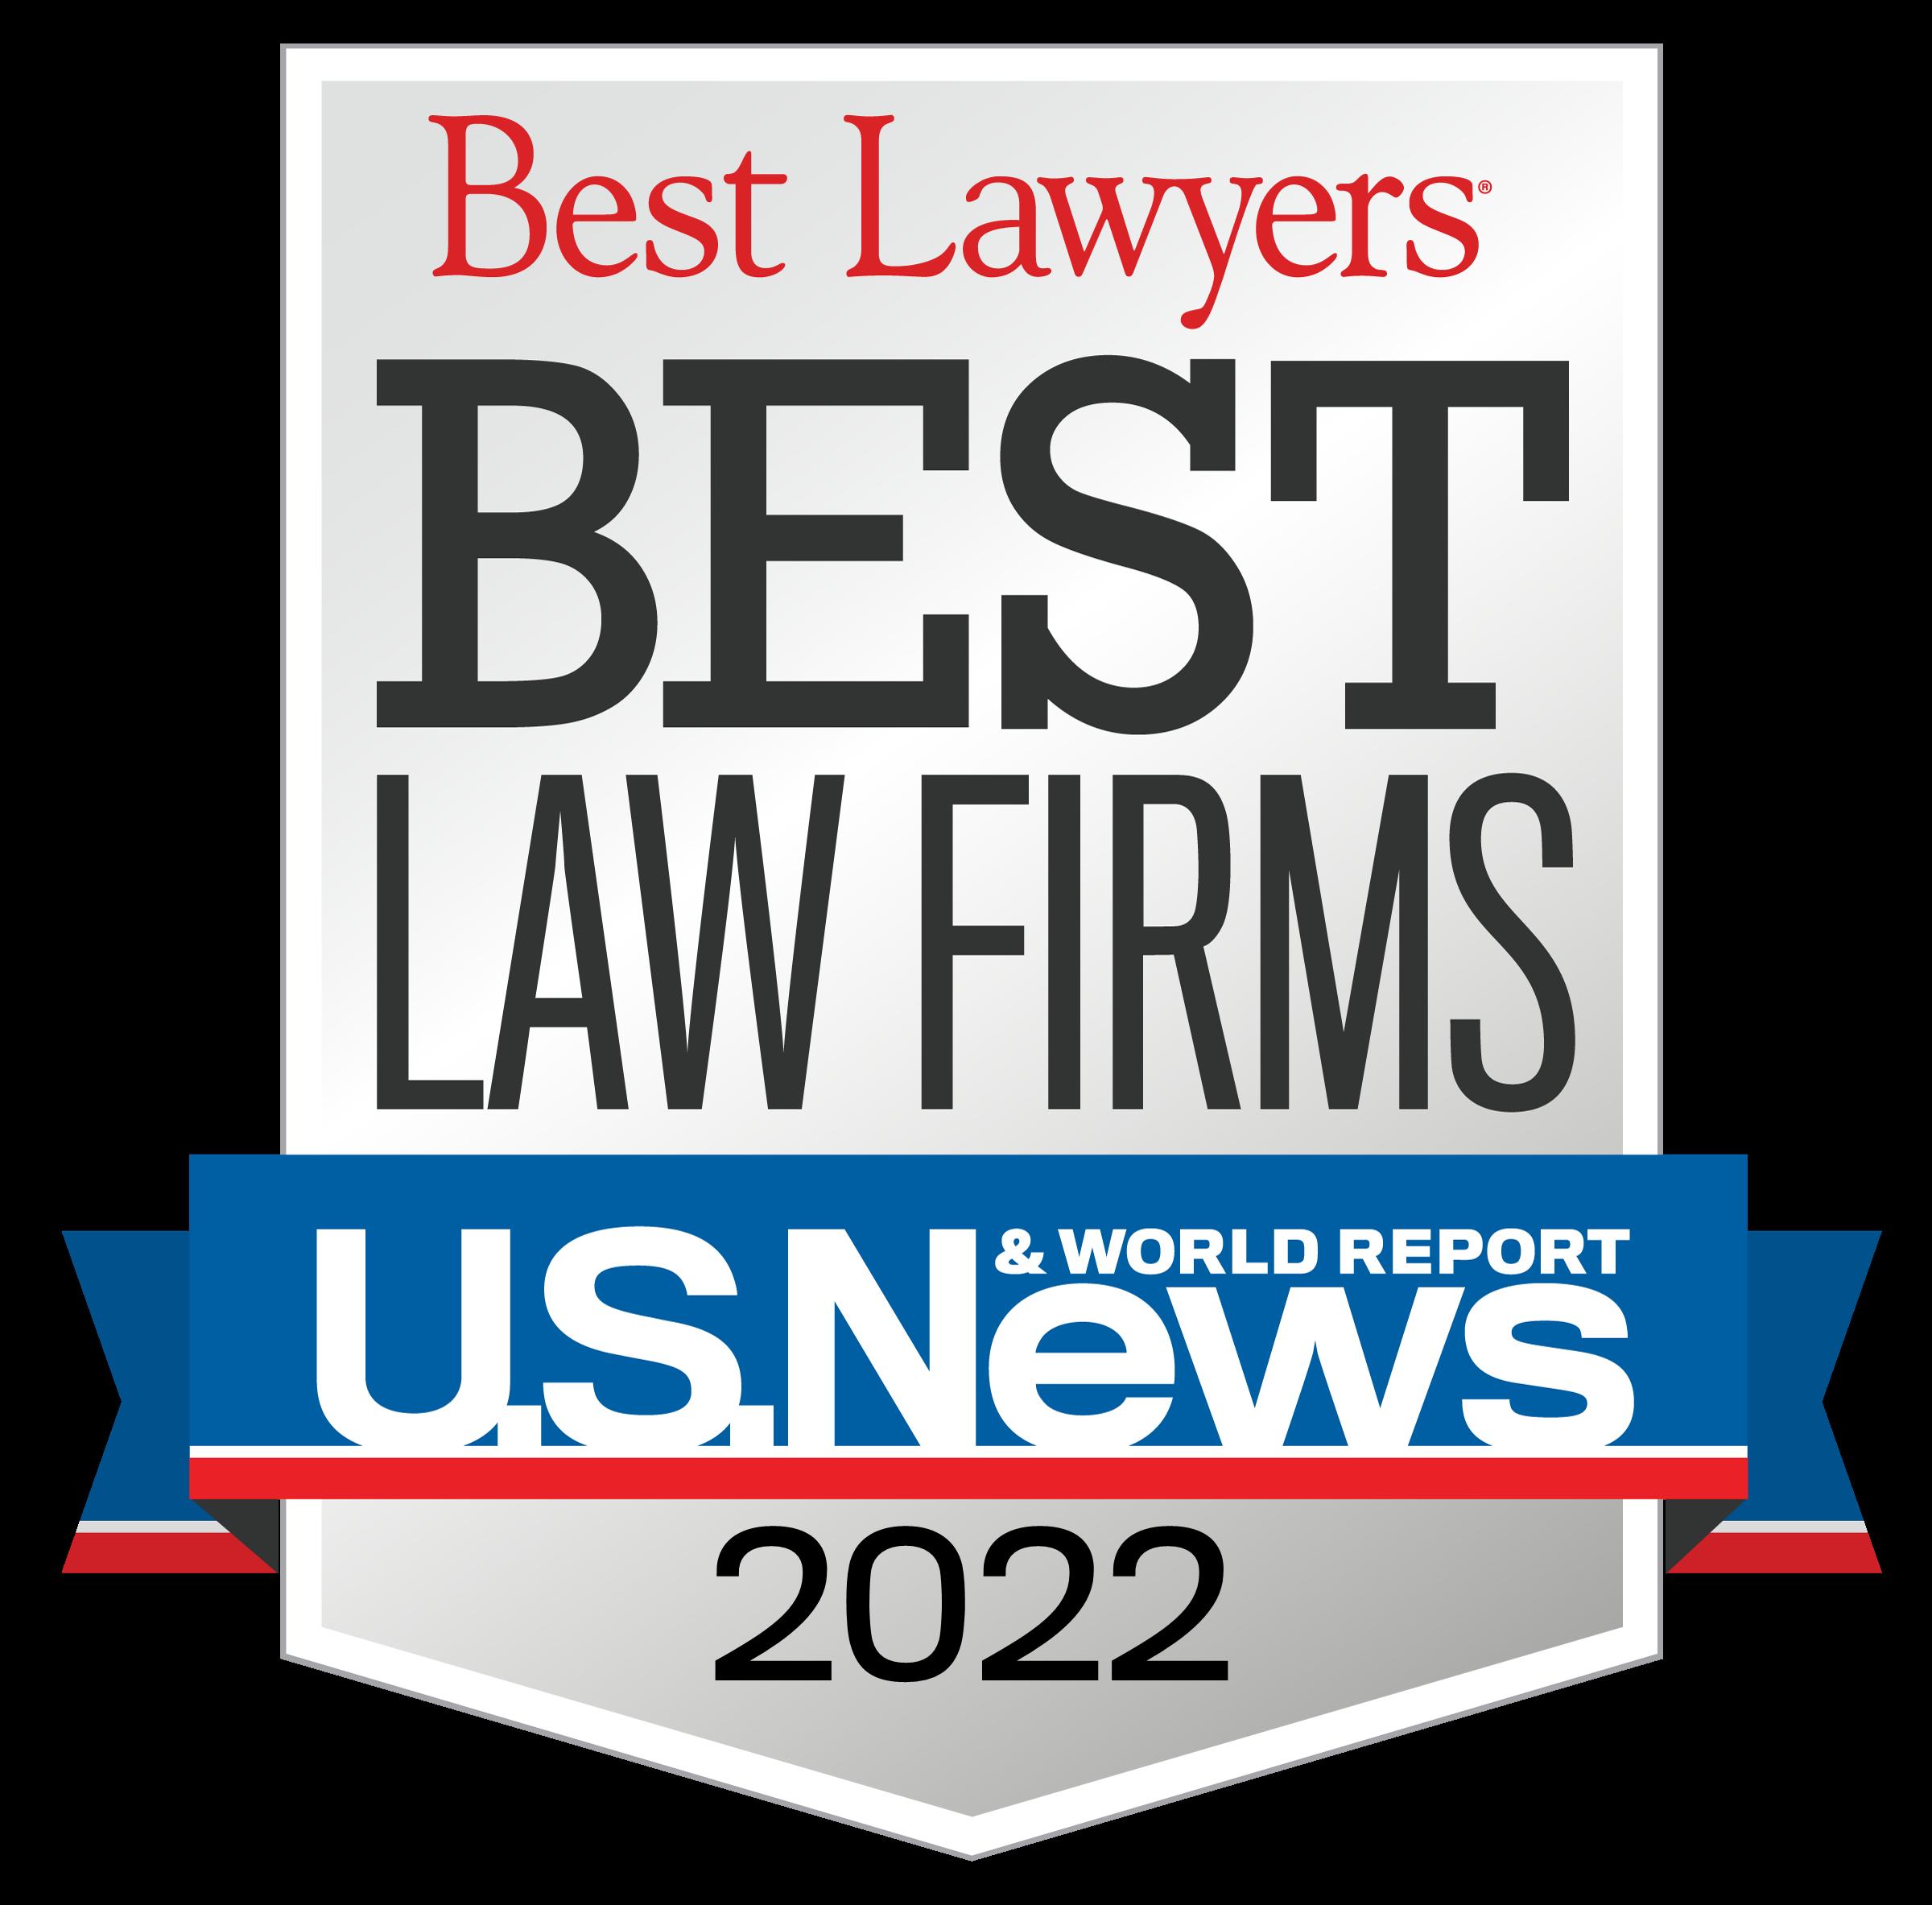 Best Lawyers Best Law Firm 2022